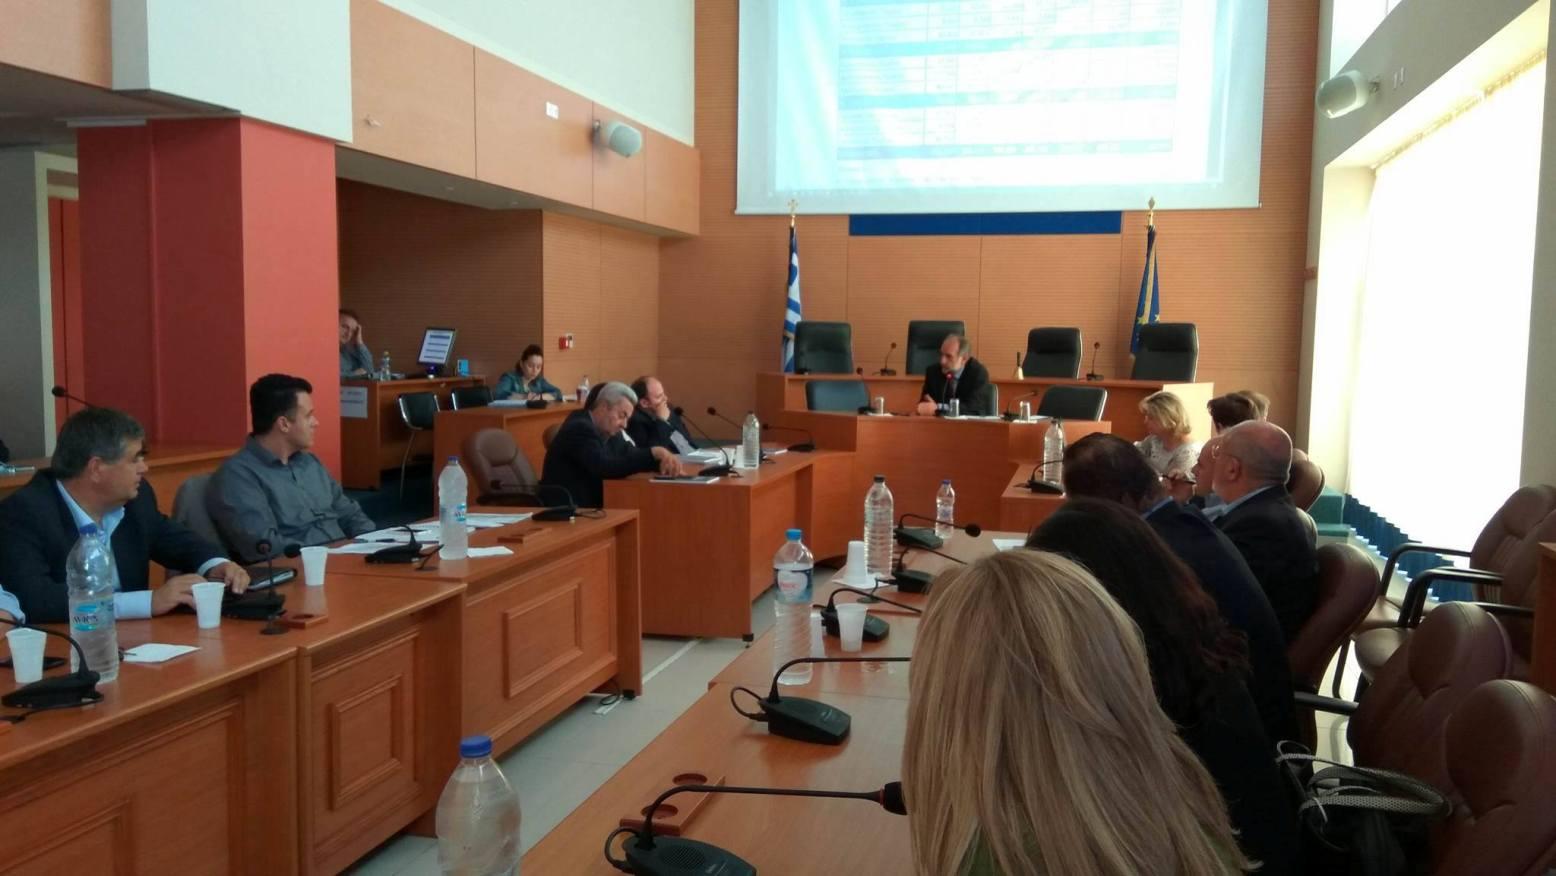 c0d67e4006a 28,8 εκατ. ευρώ σε 519 επιχειρήσεις της Περιφέρειας - AgrinioNews